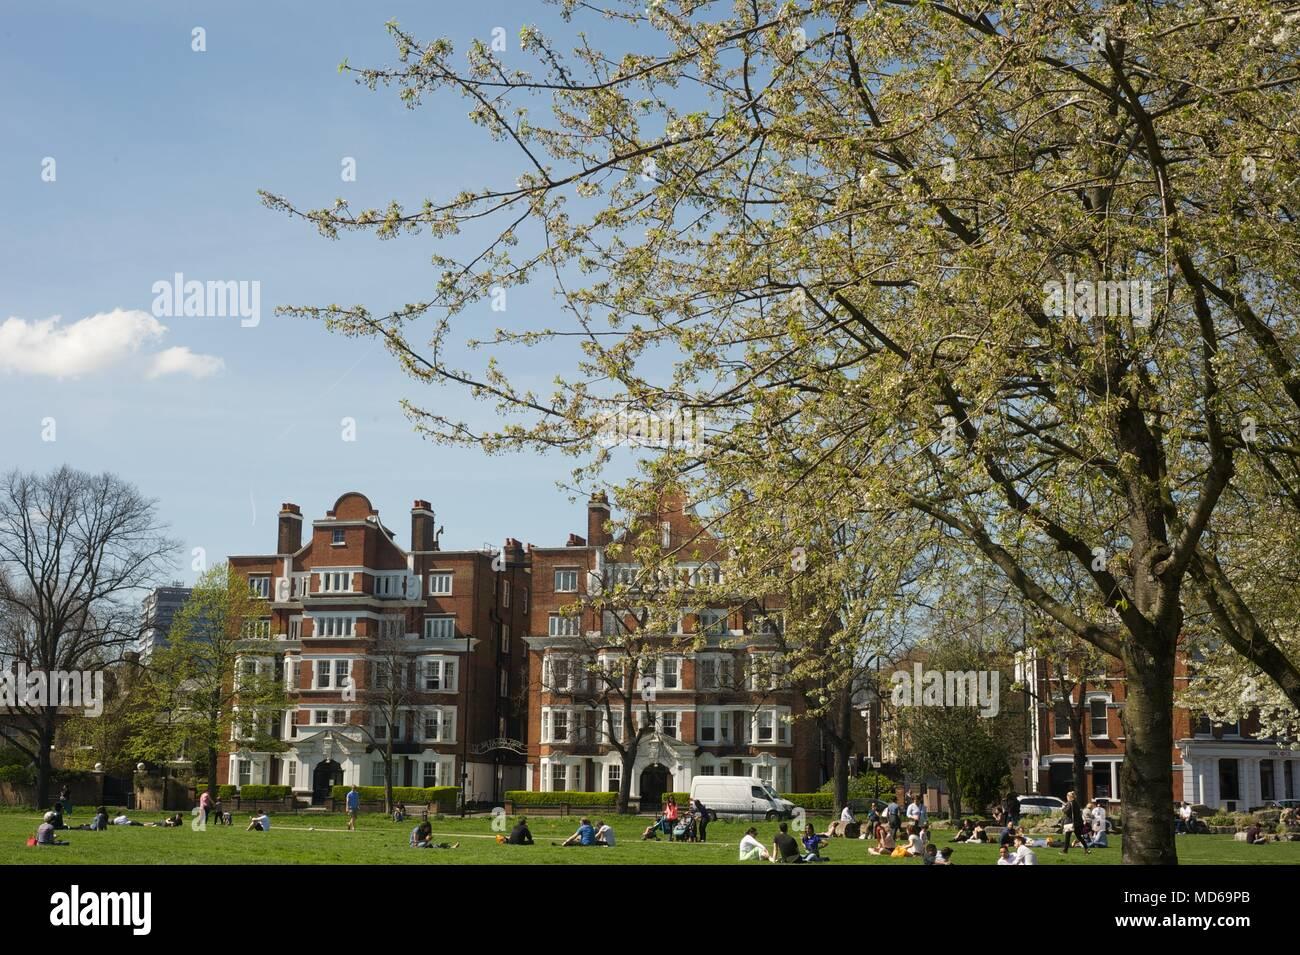 People having enjoying the summer sunshine on chiswick green 2018 - Stock Image